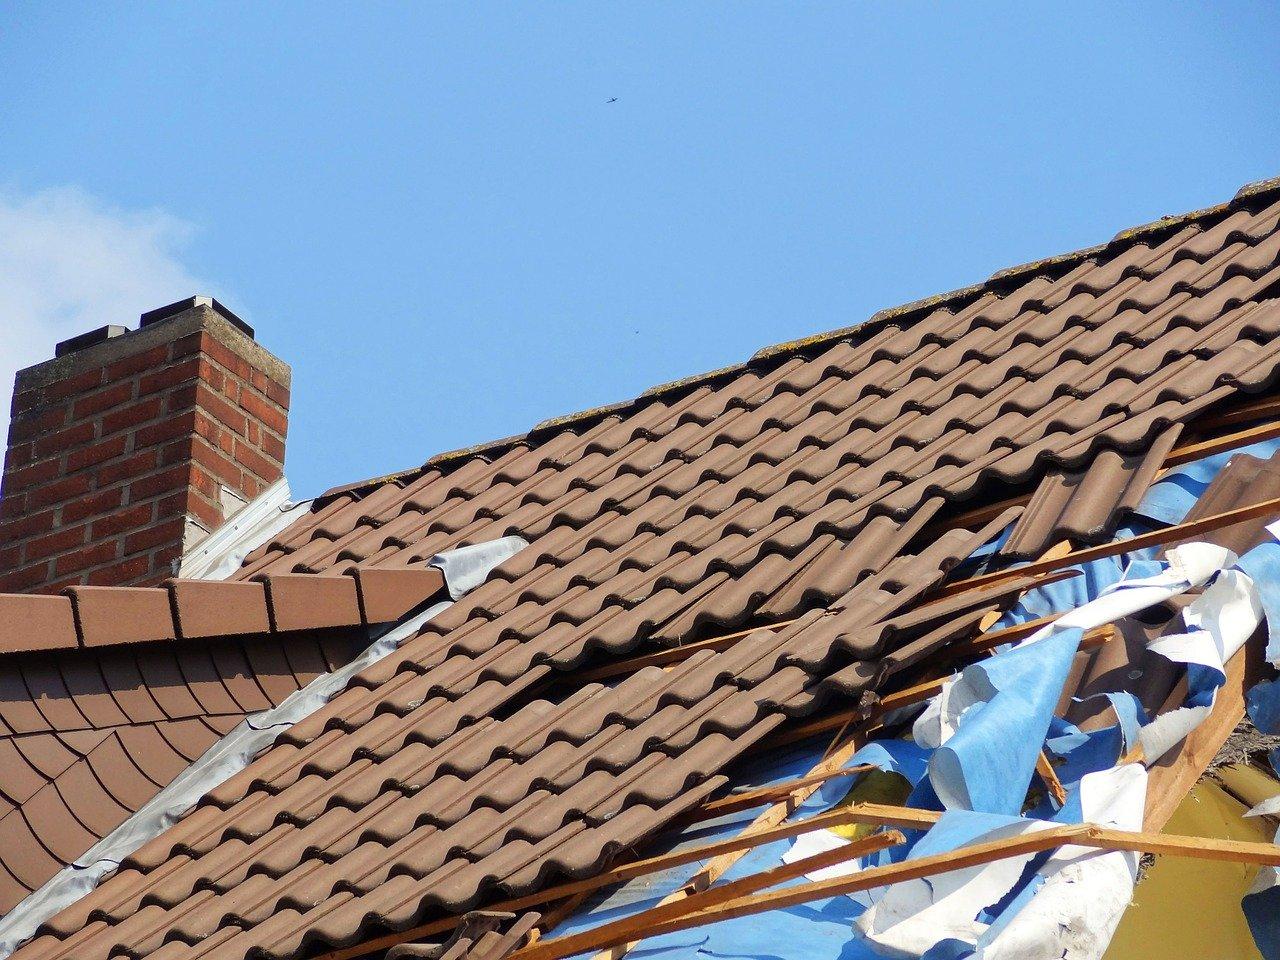 nokvorst reparatie, nokvorst renovatie in 5282 Boxtel